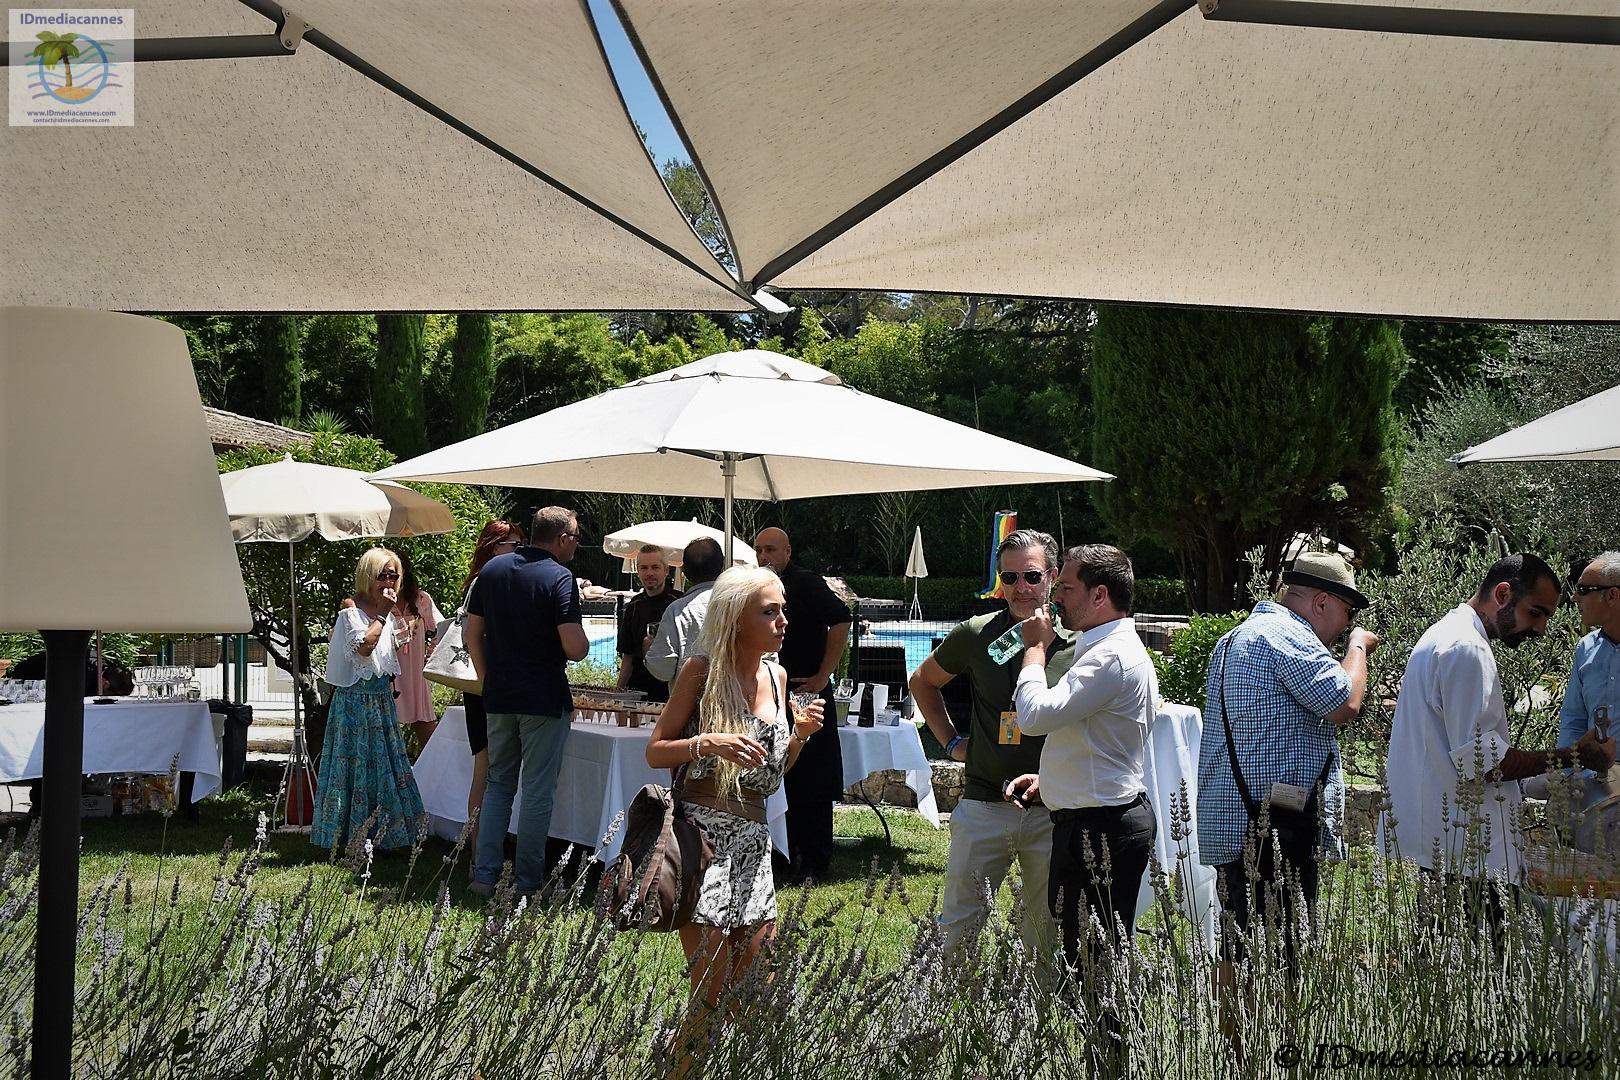 Les etoiles de mougins 2017 basile arnaud idmediacannes for Le jardin restaurant mougins